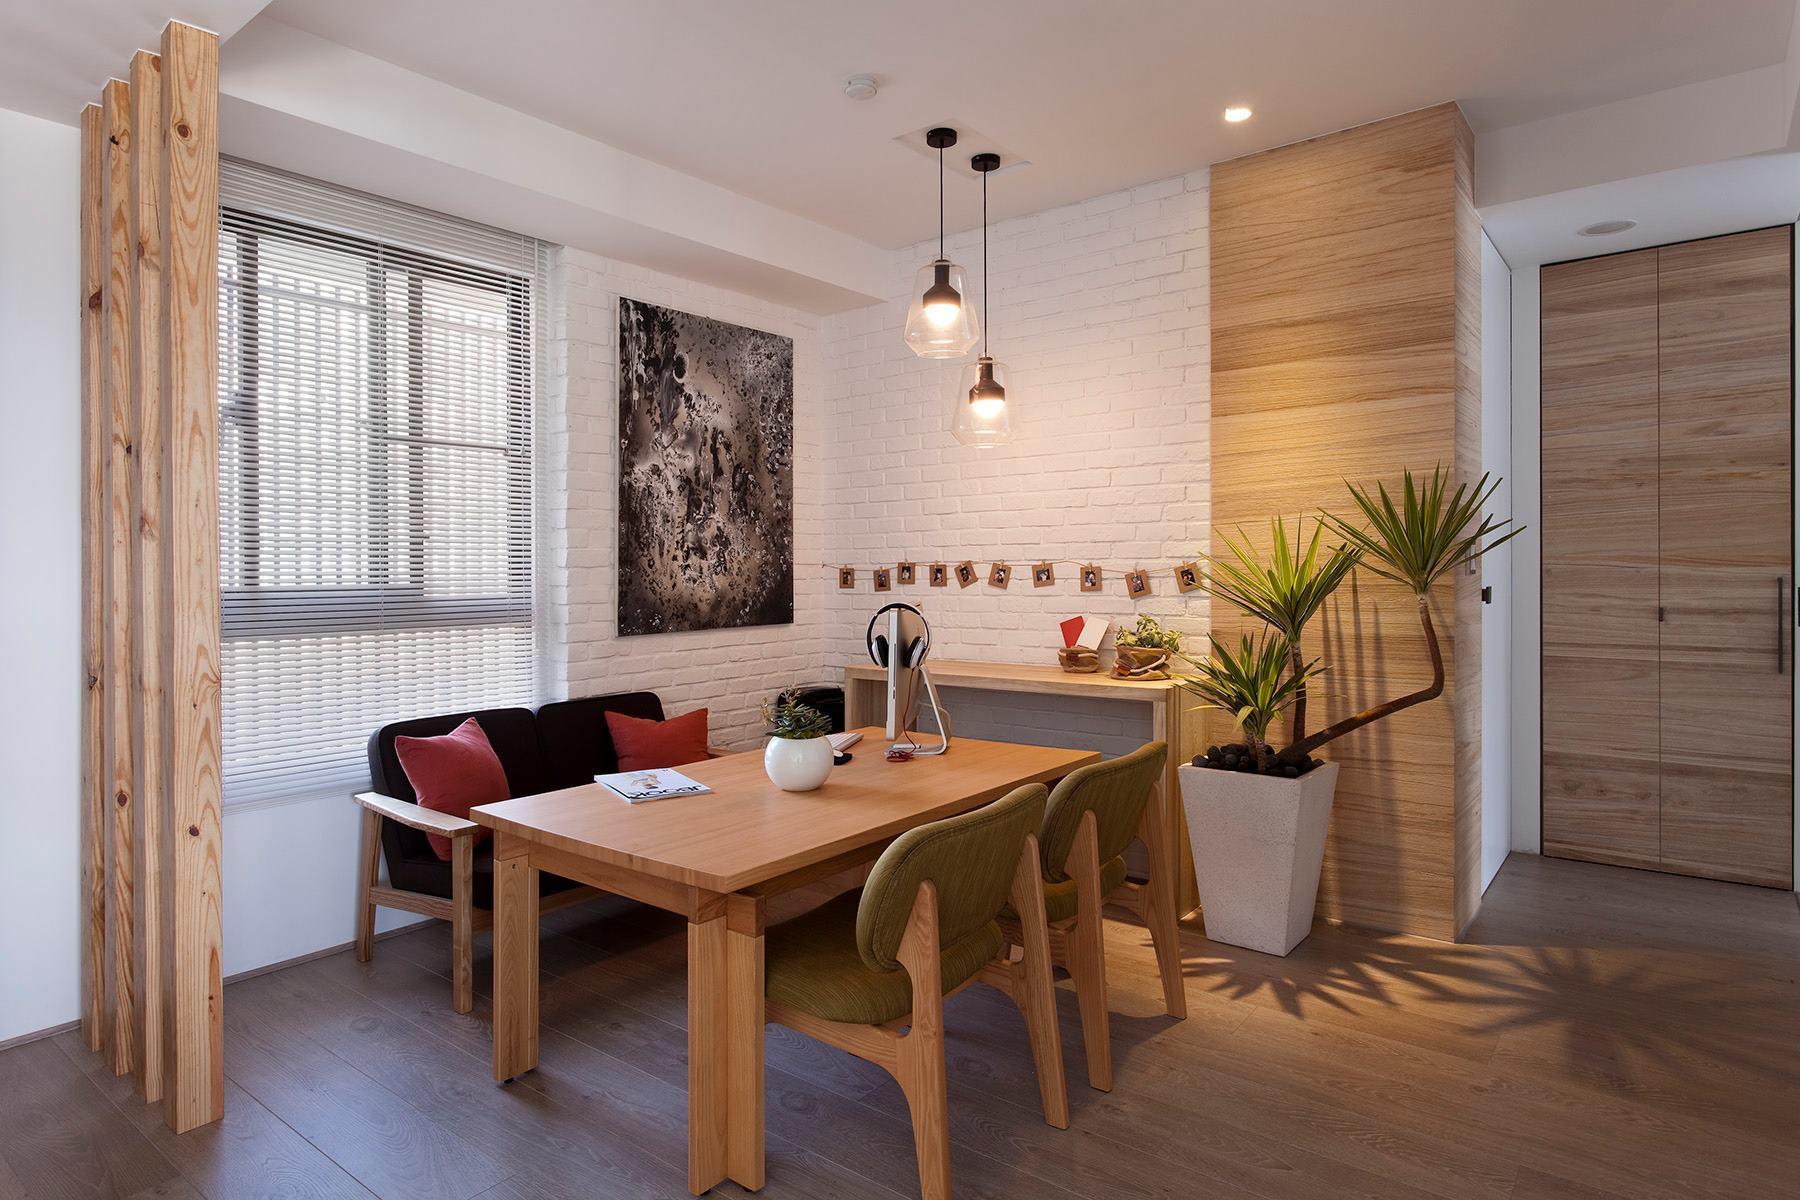 дизайн квартир с деревом фото